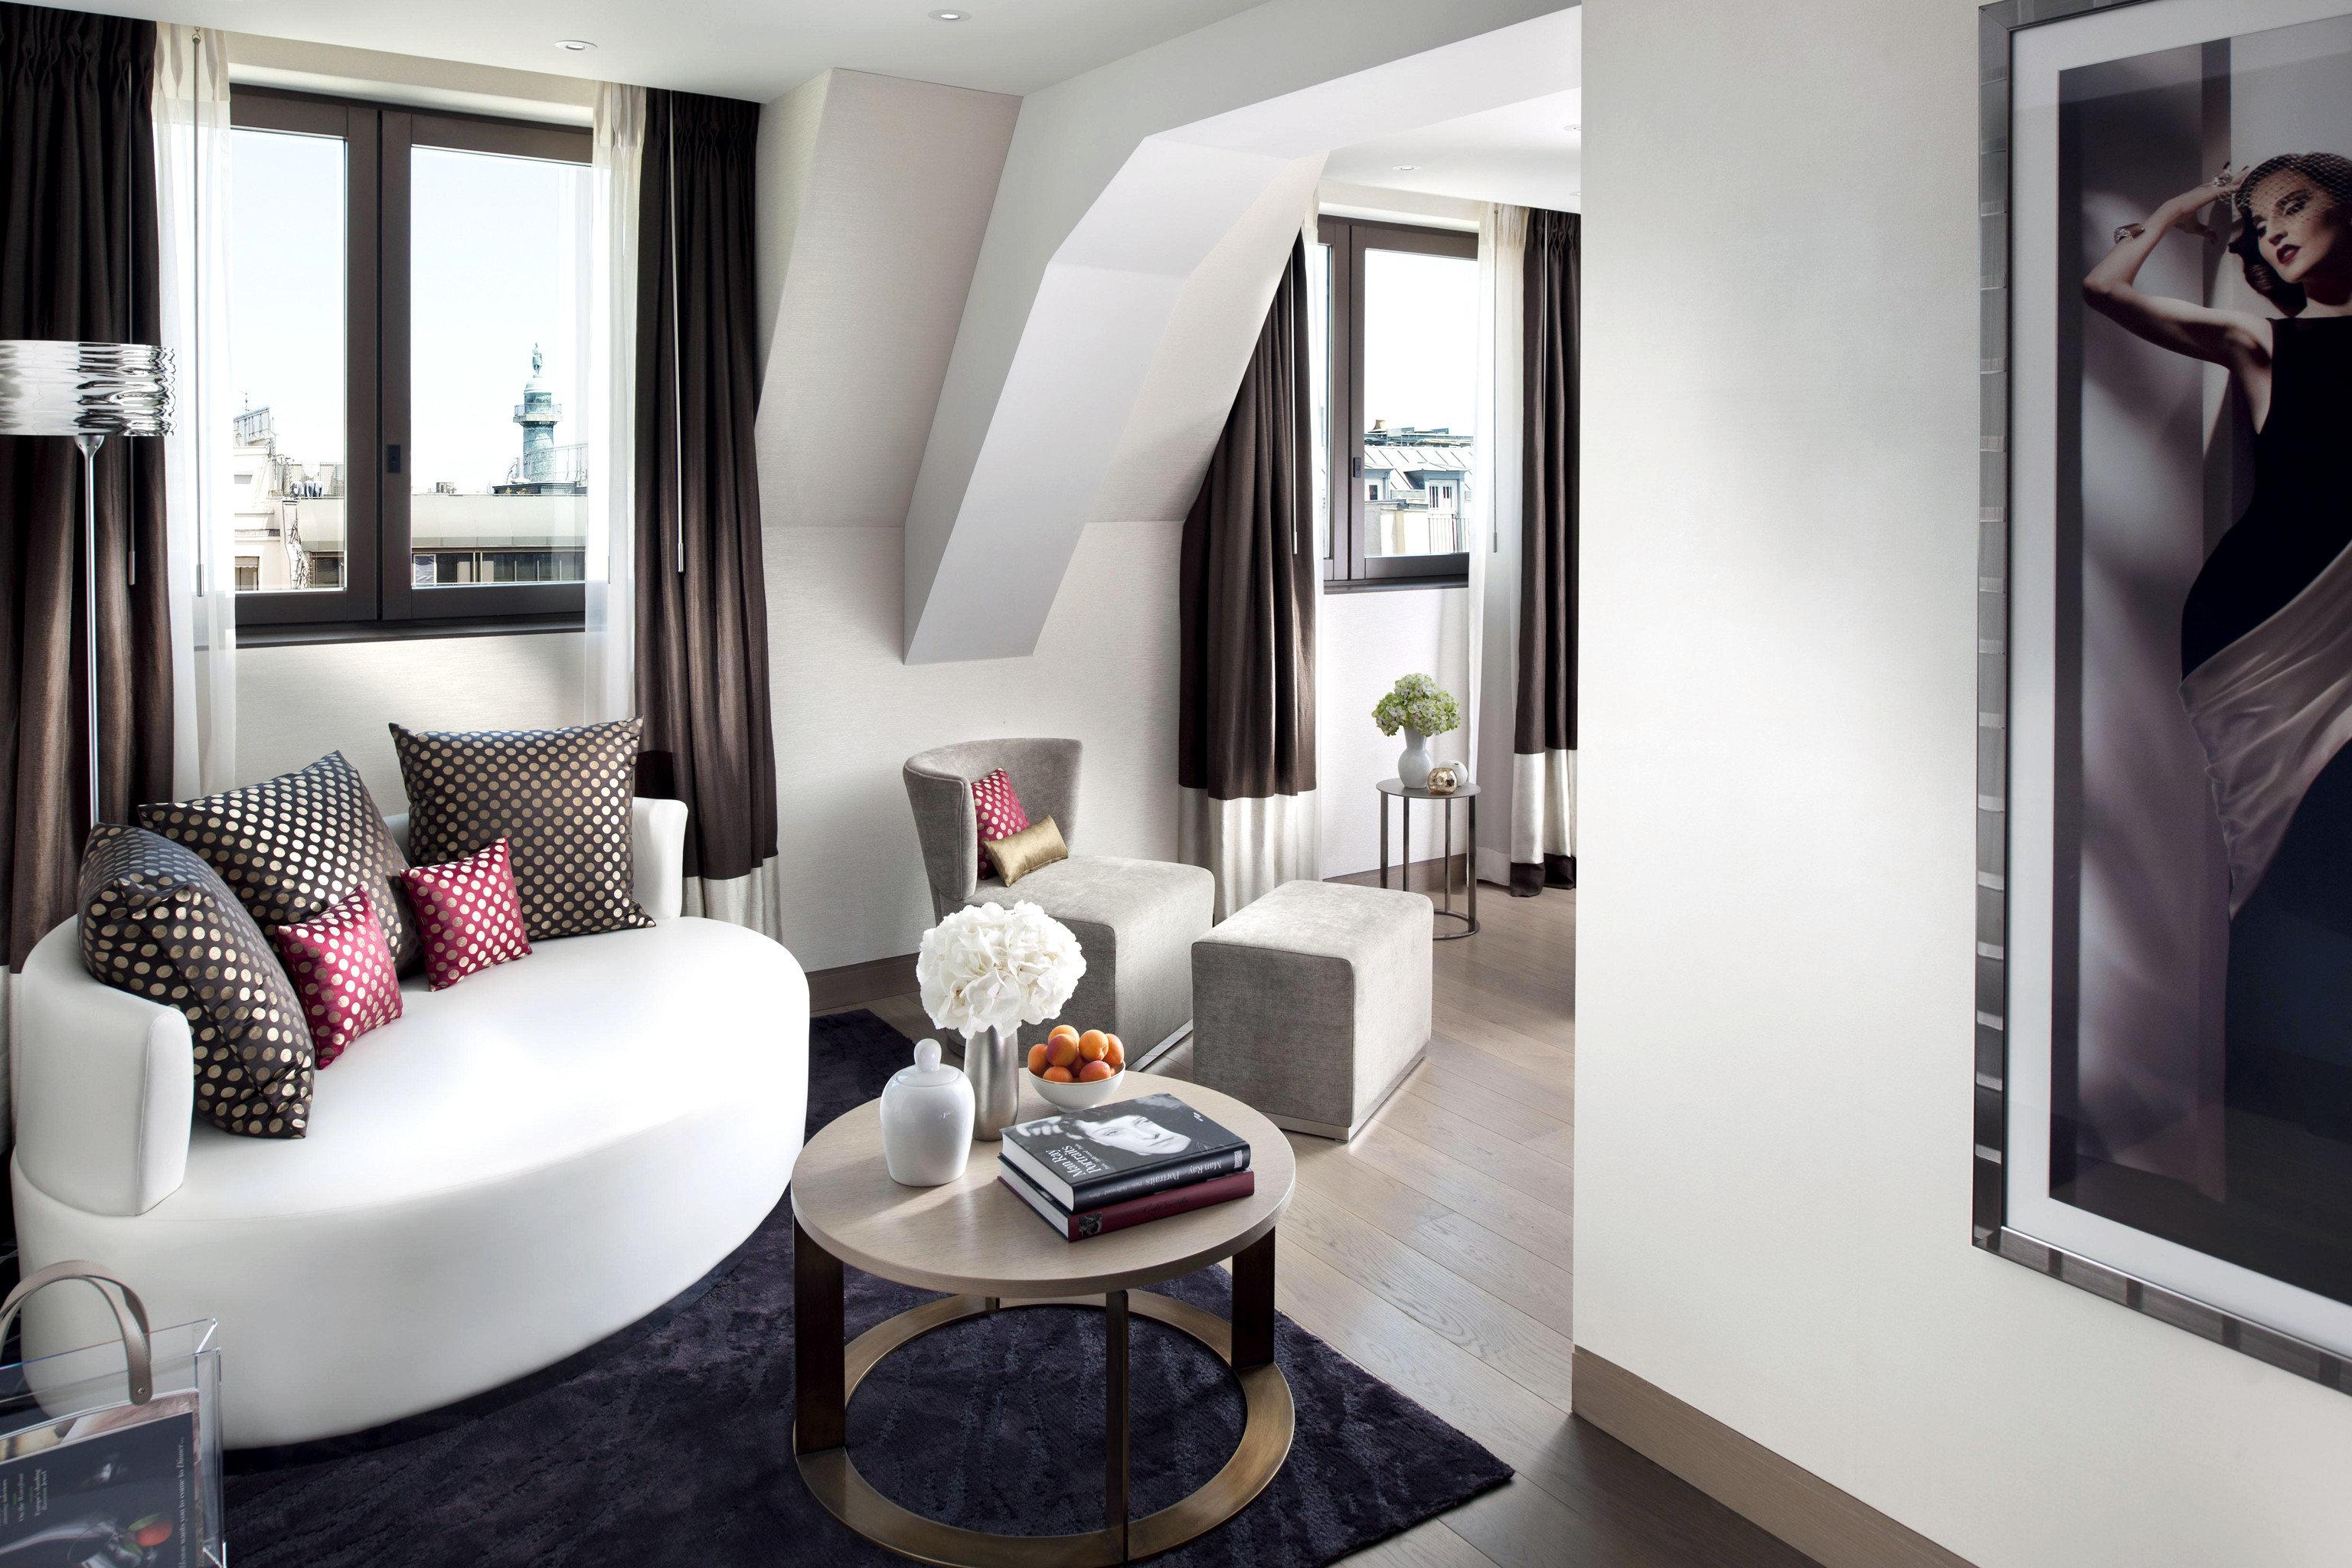 Bedroom City Elegant Luxury Modern Suite property living room home condominium